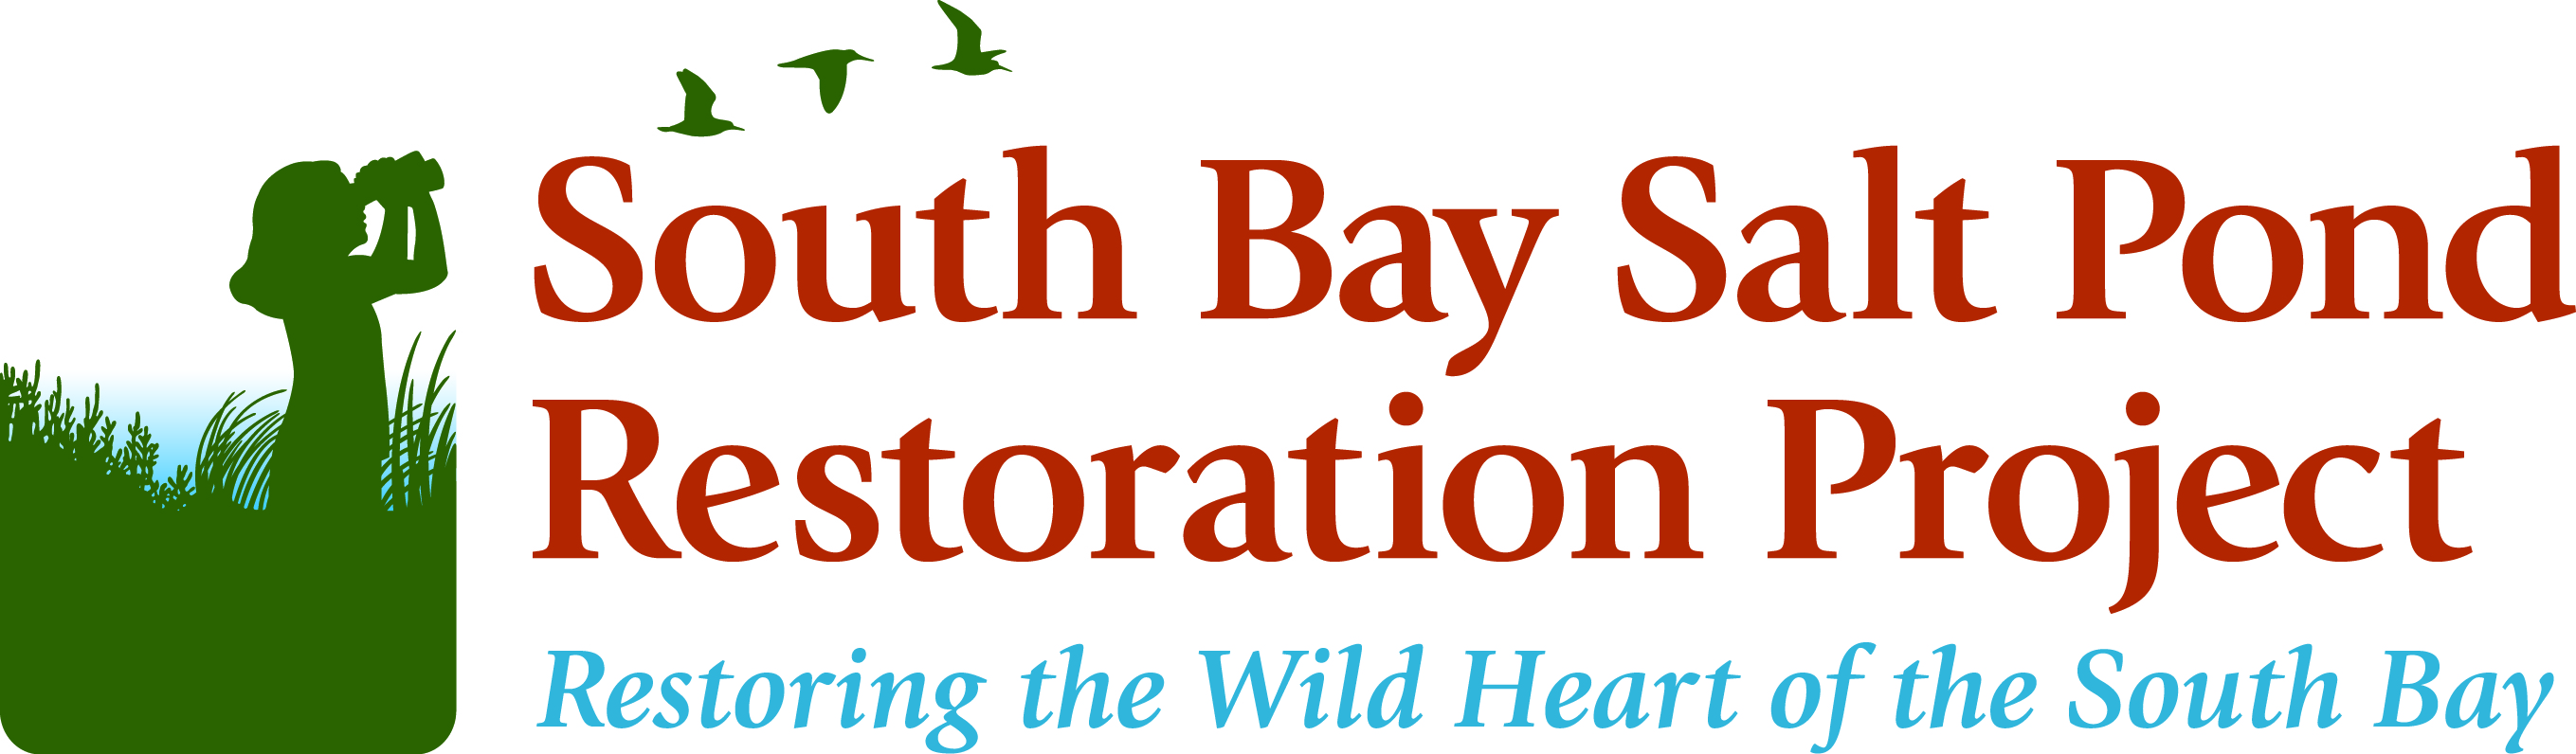 South Bay Salt Pond Restoration Project logo